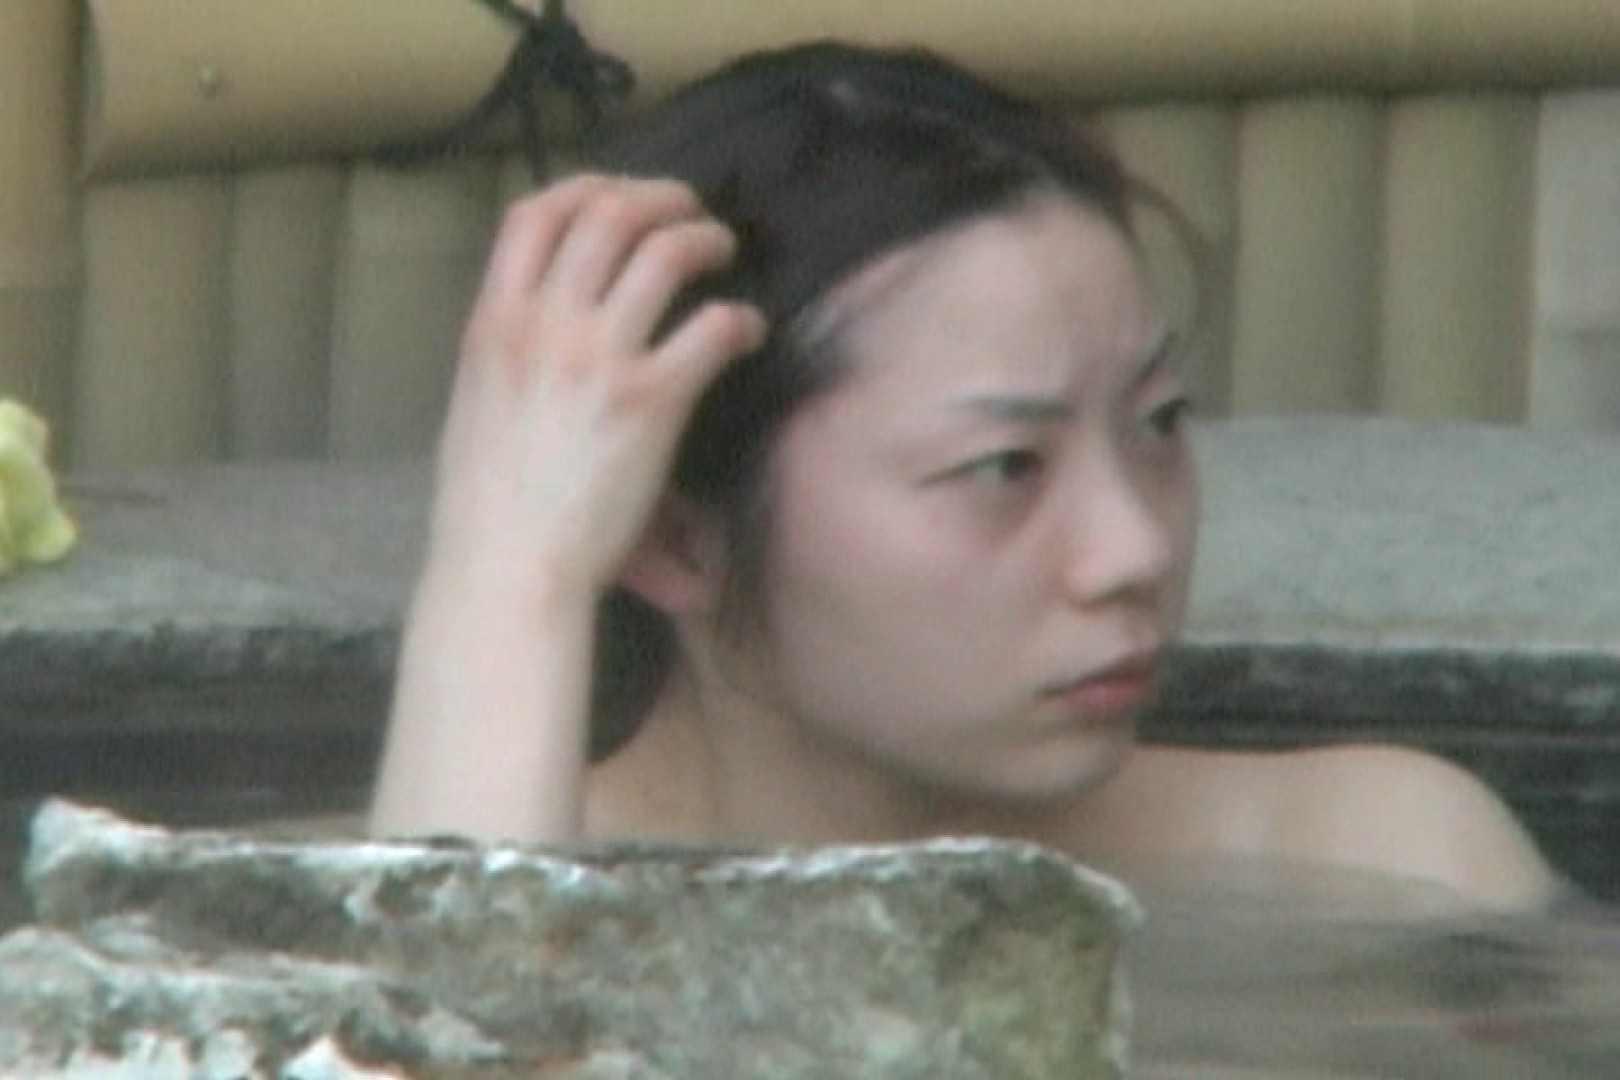 Aquaな露天風呂Vol.596 OLセックス  77画像 18